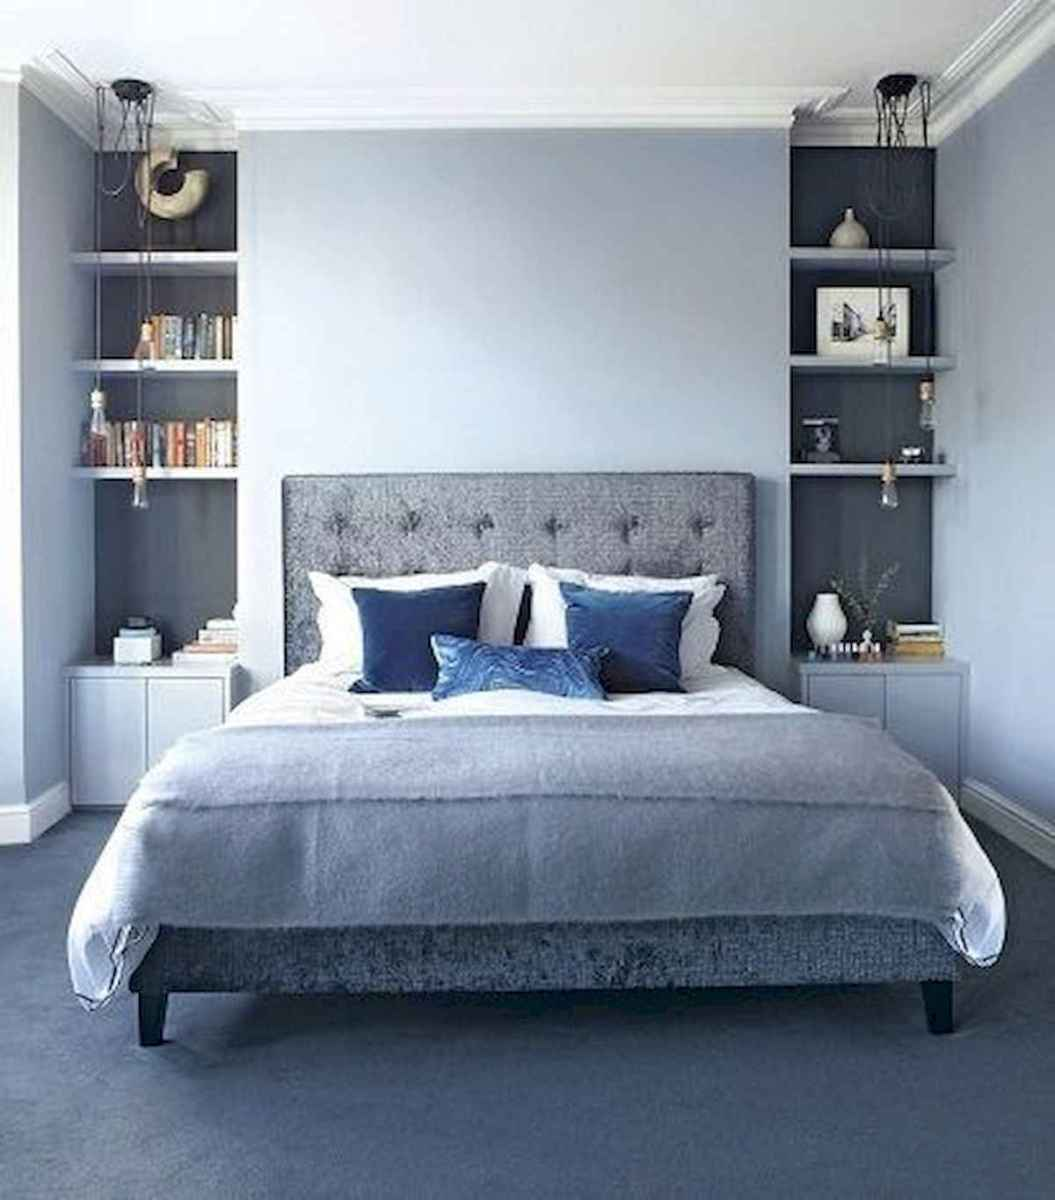 80 Fantastic Small Apartment Bedroom College Design Ideas and Decor (50)